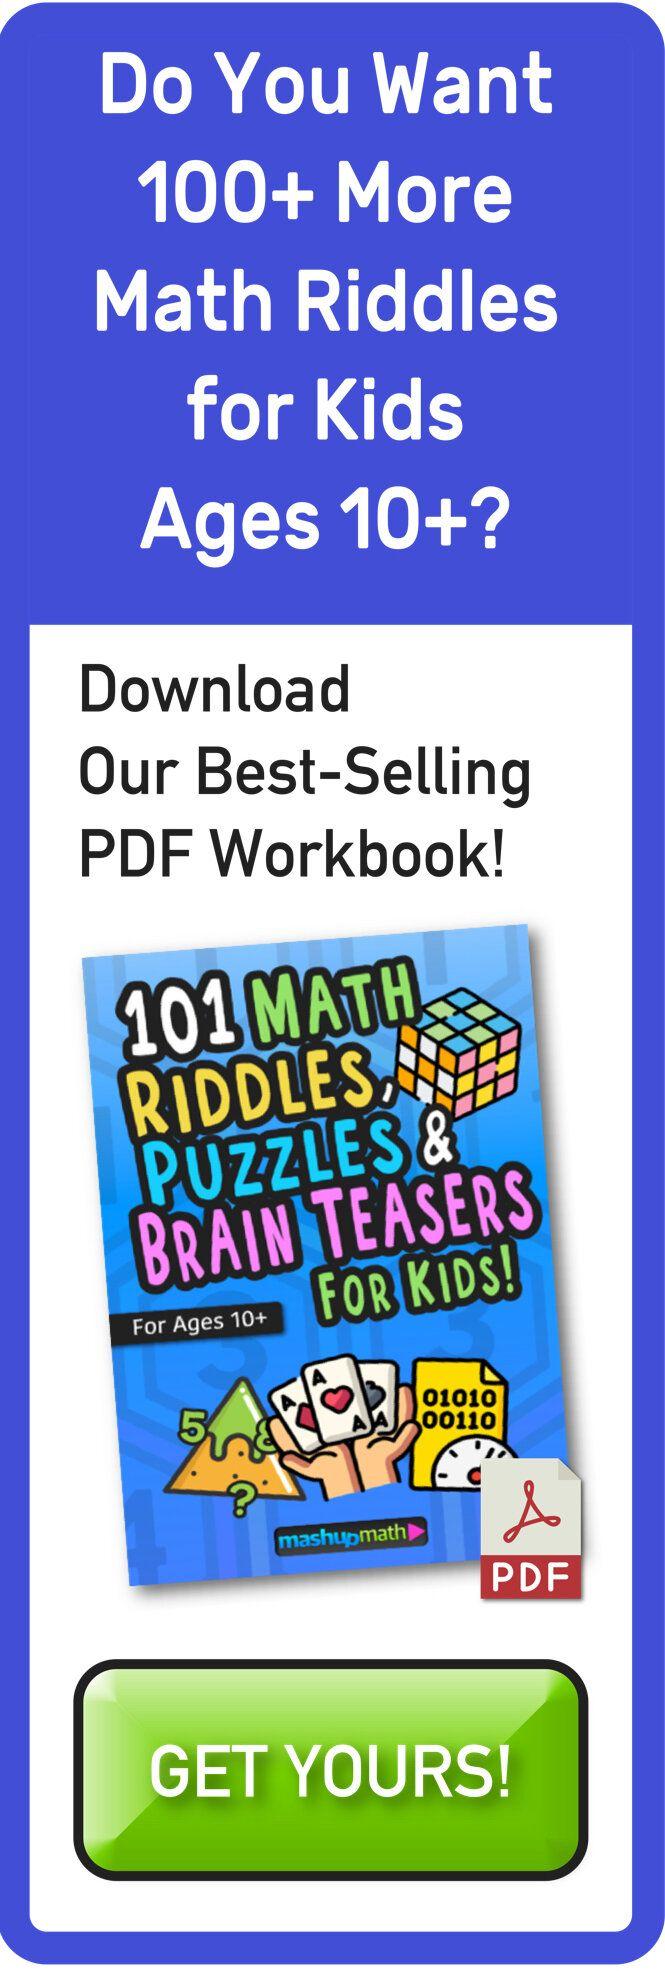 Free Math Puzzles — Mashup Math in 2020 Math riddles